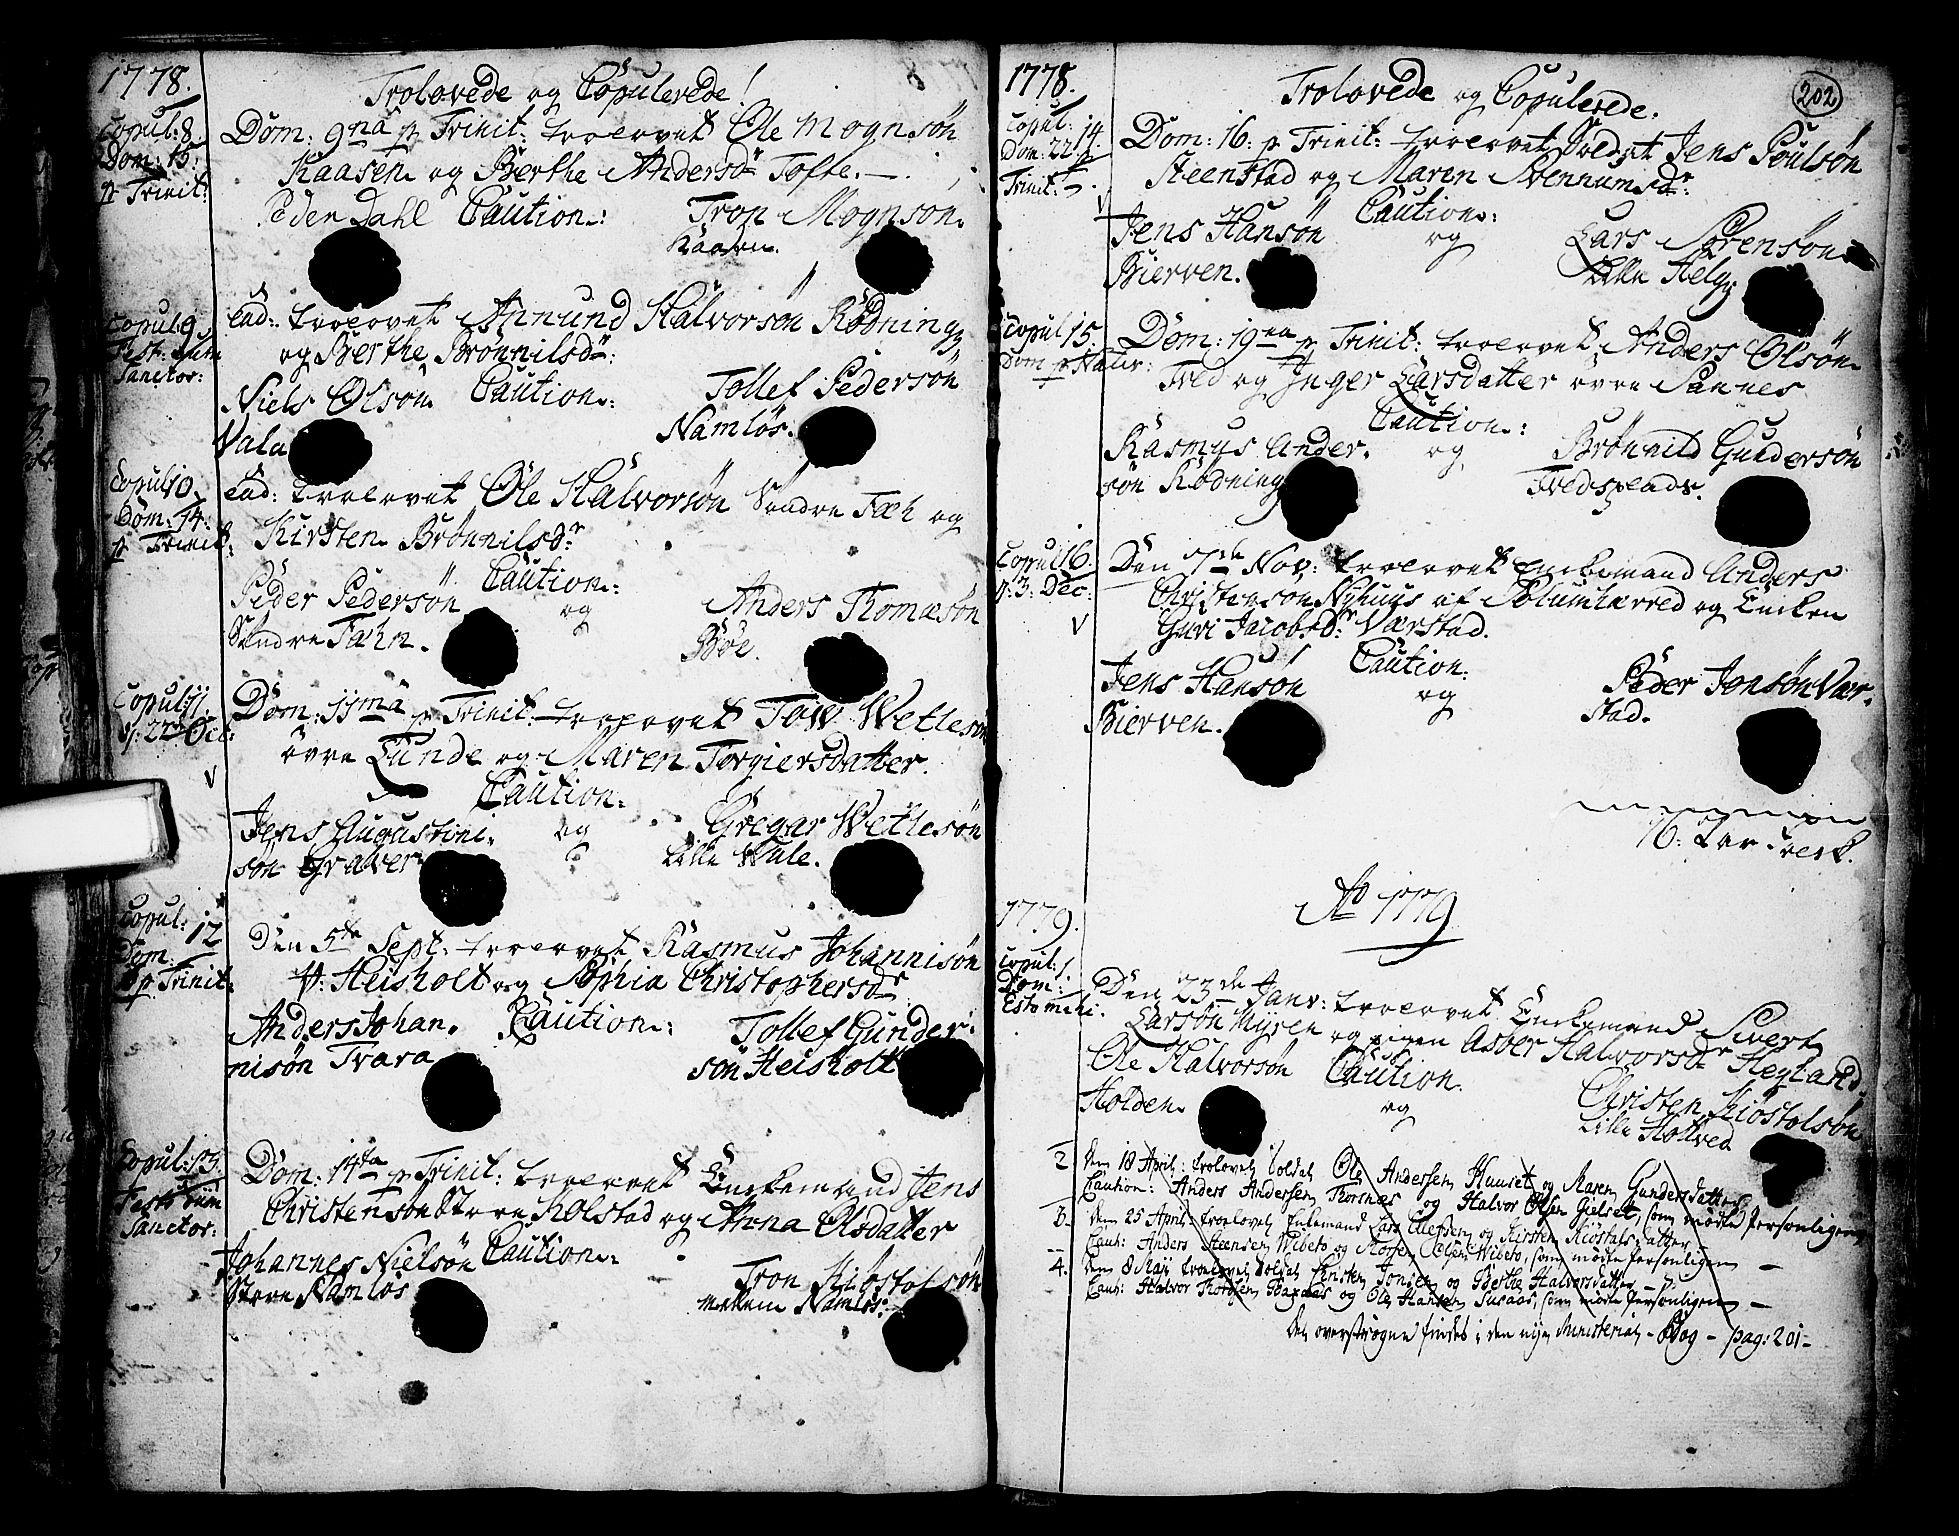 SAKO, Holla kirkebøker, F/Fa/L0001: Ministerialbok nr. 1, 1717-1779, s. 202